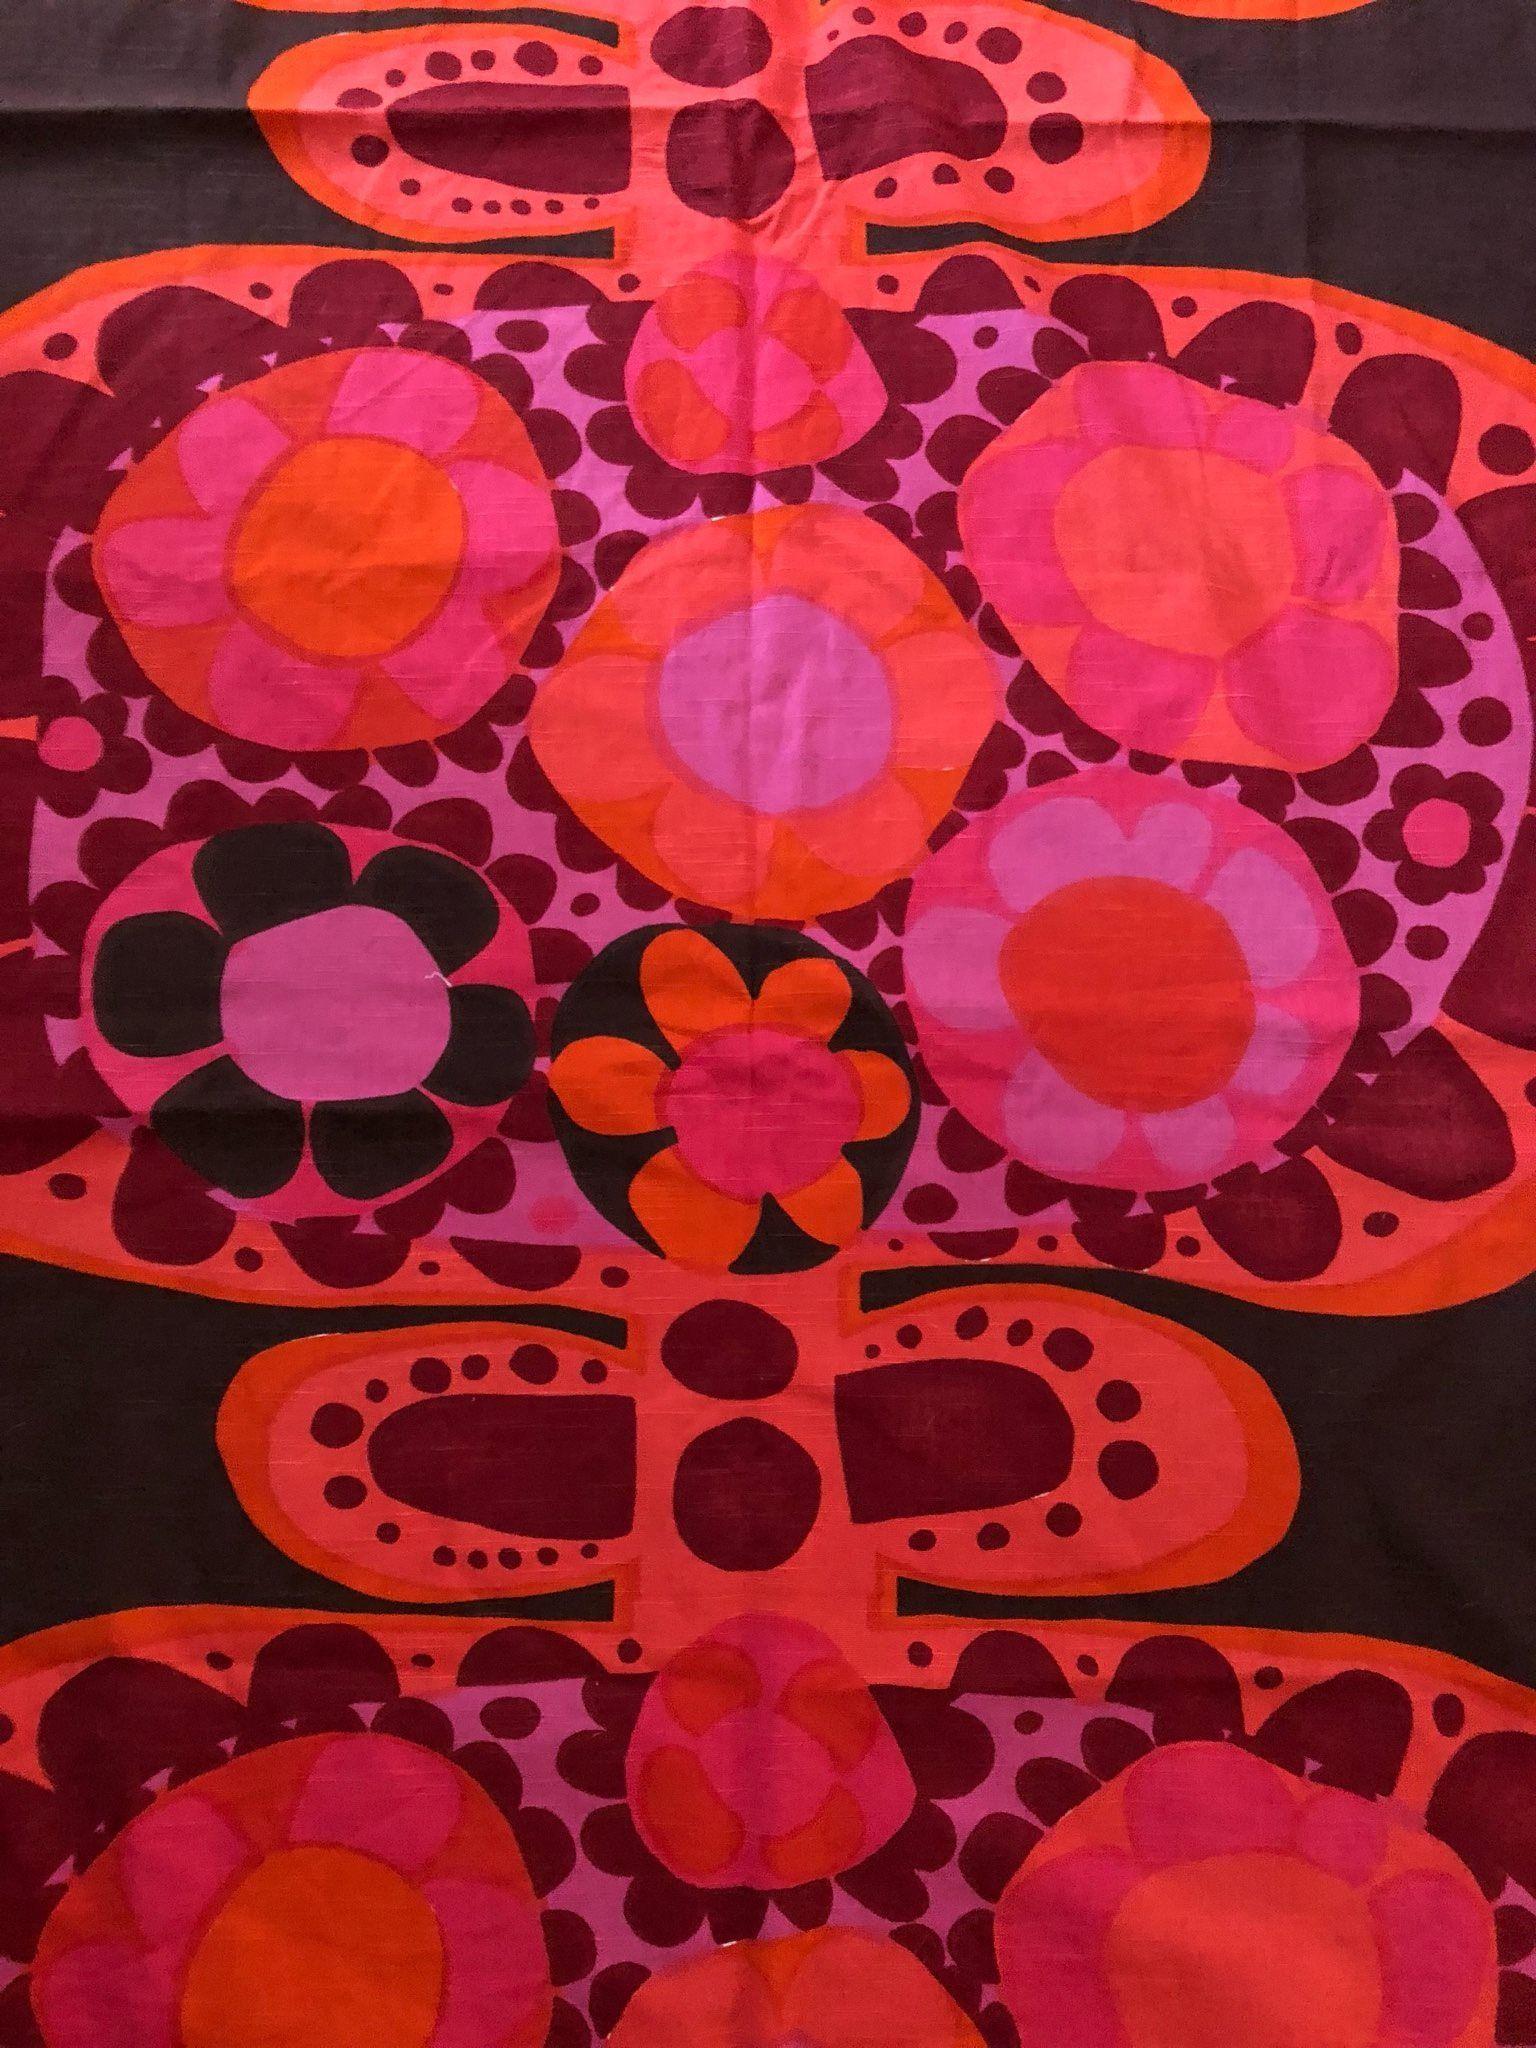 60e720405e4b Tyg retro vintage 60-tal Mykero Saini Salonen Borås Cotton | textile ...